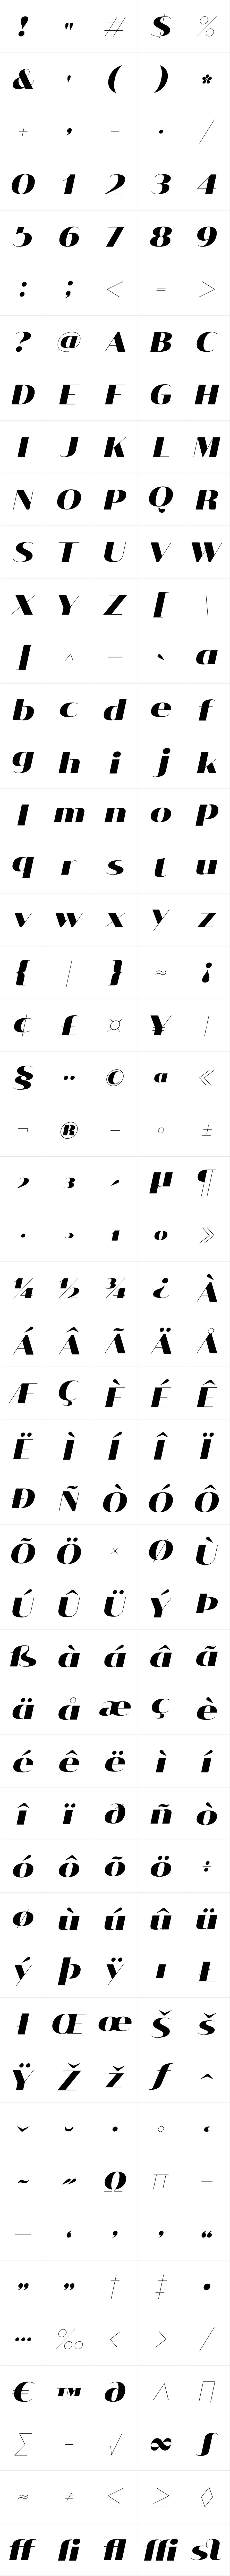 Vage Bold Italic